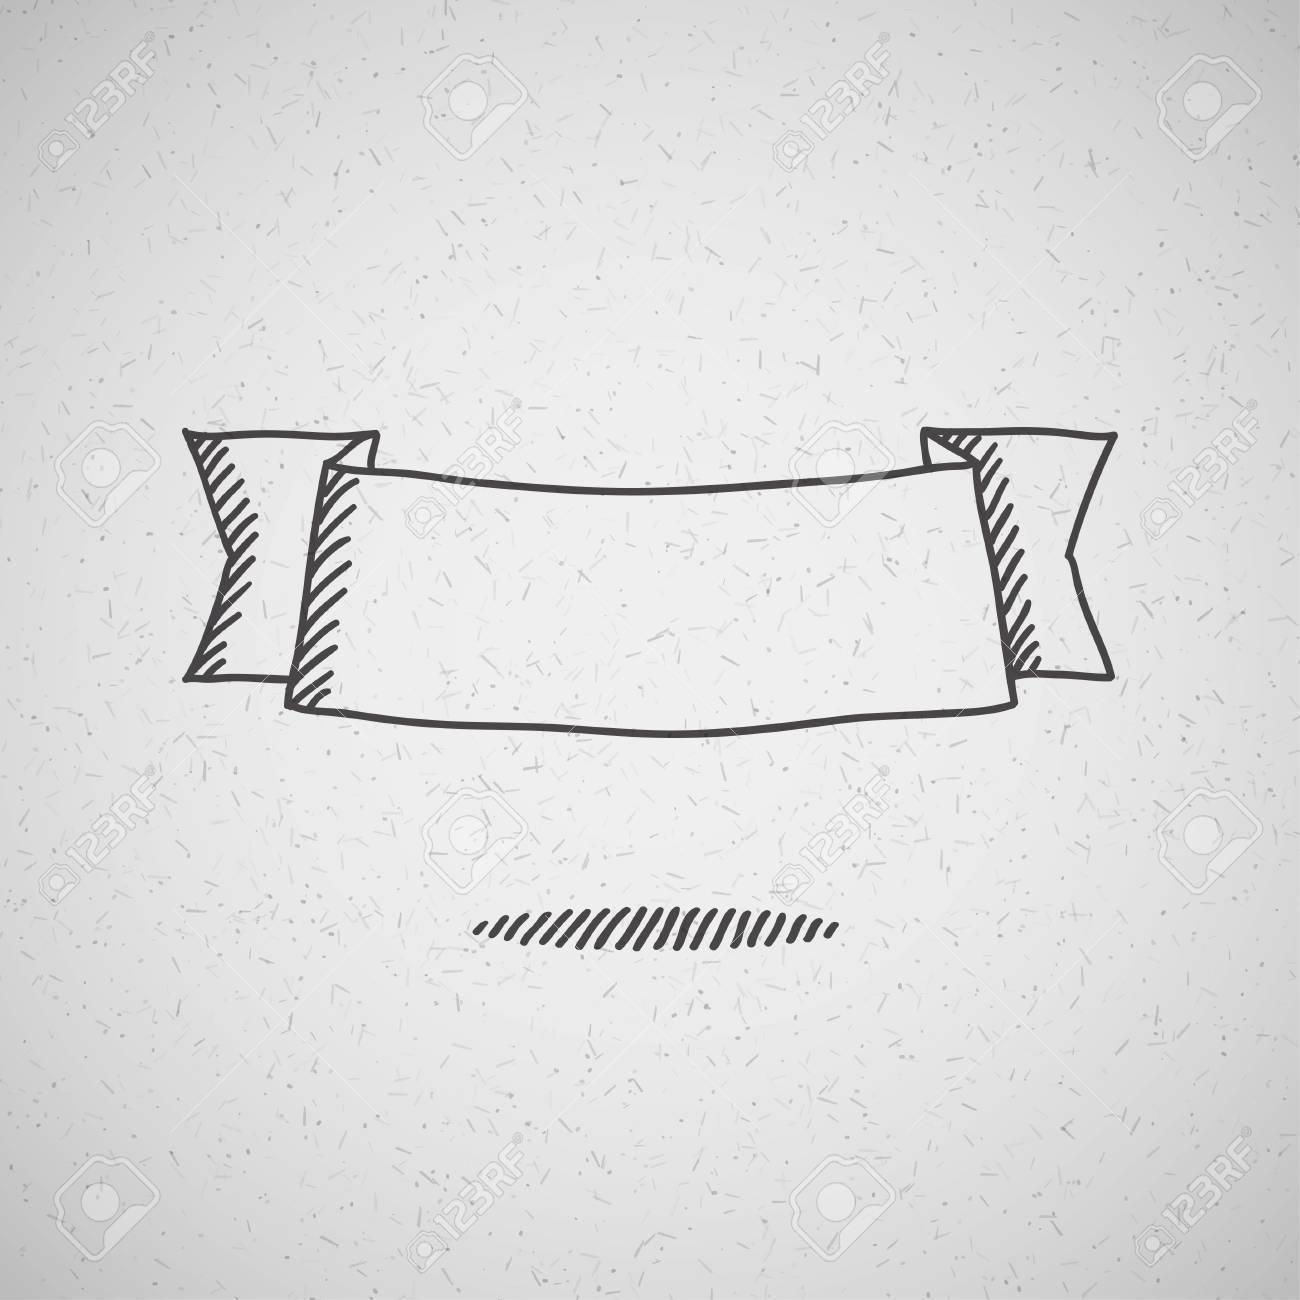 hand drawn ribbon on old cardboard Stock Vector - 21172808